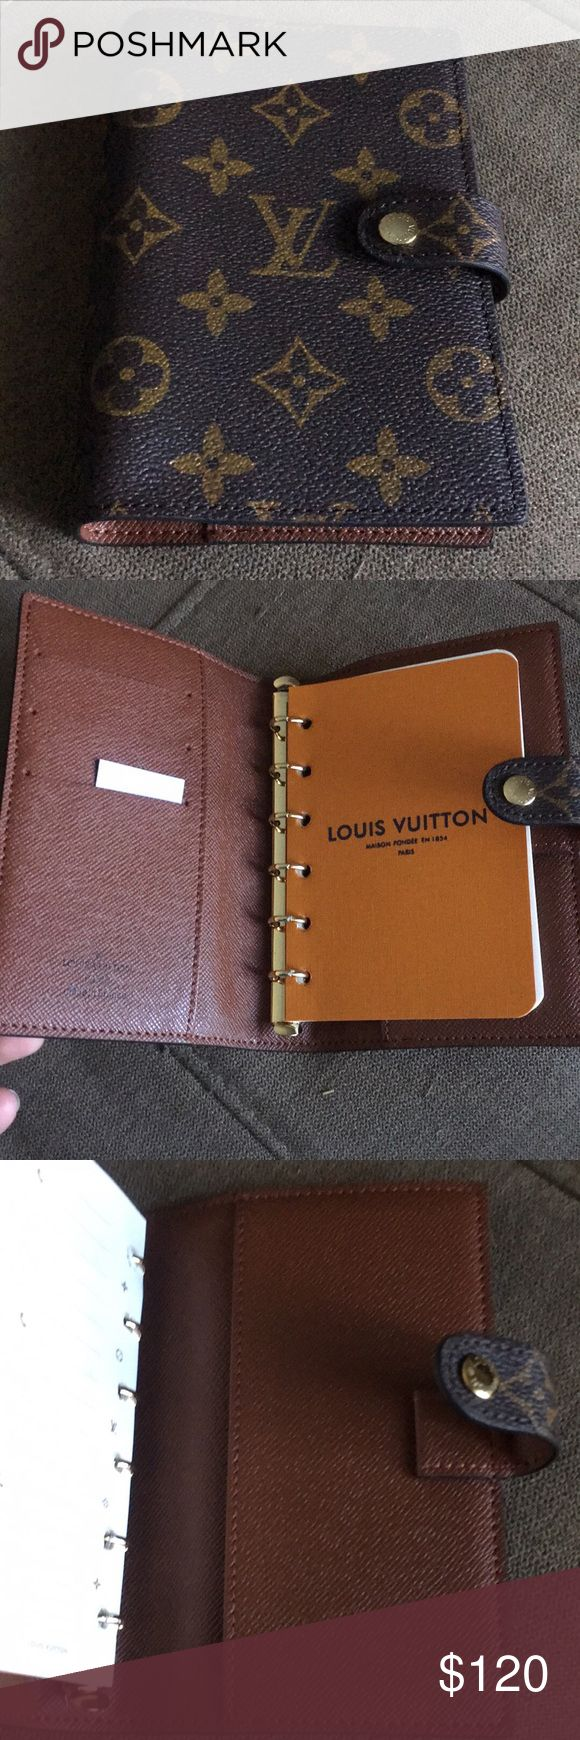 Louis Vuitton Agenda Pm Inspired LV agenda pm. Brand new. READ DESCRIPTION BEFORE YOU BUY! Louis Vuitton Accessories